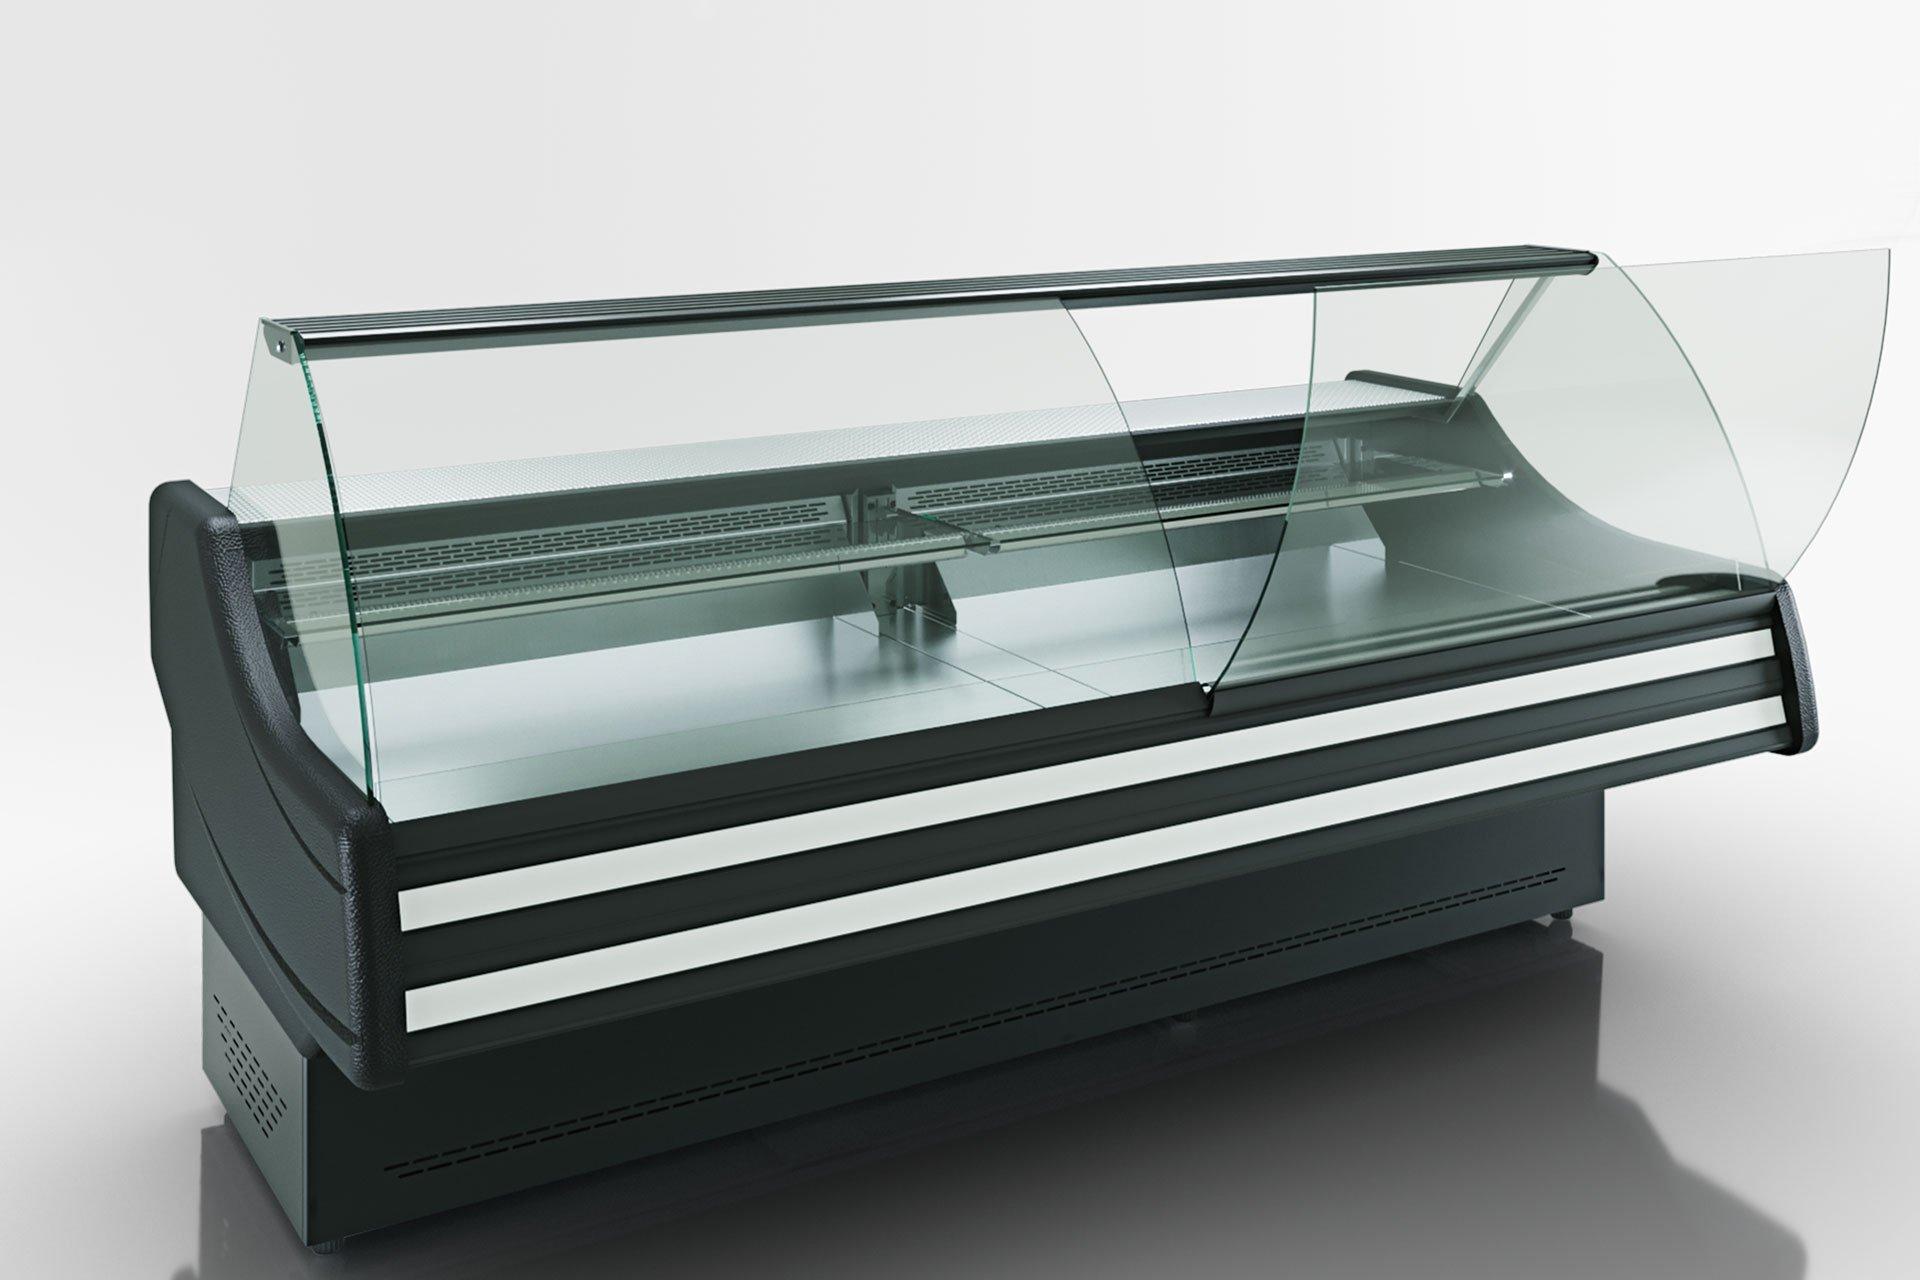 Sonata AG 120 patisserie OS 125-DLA